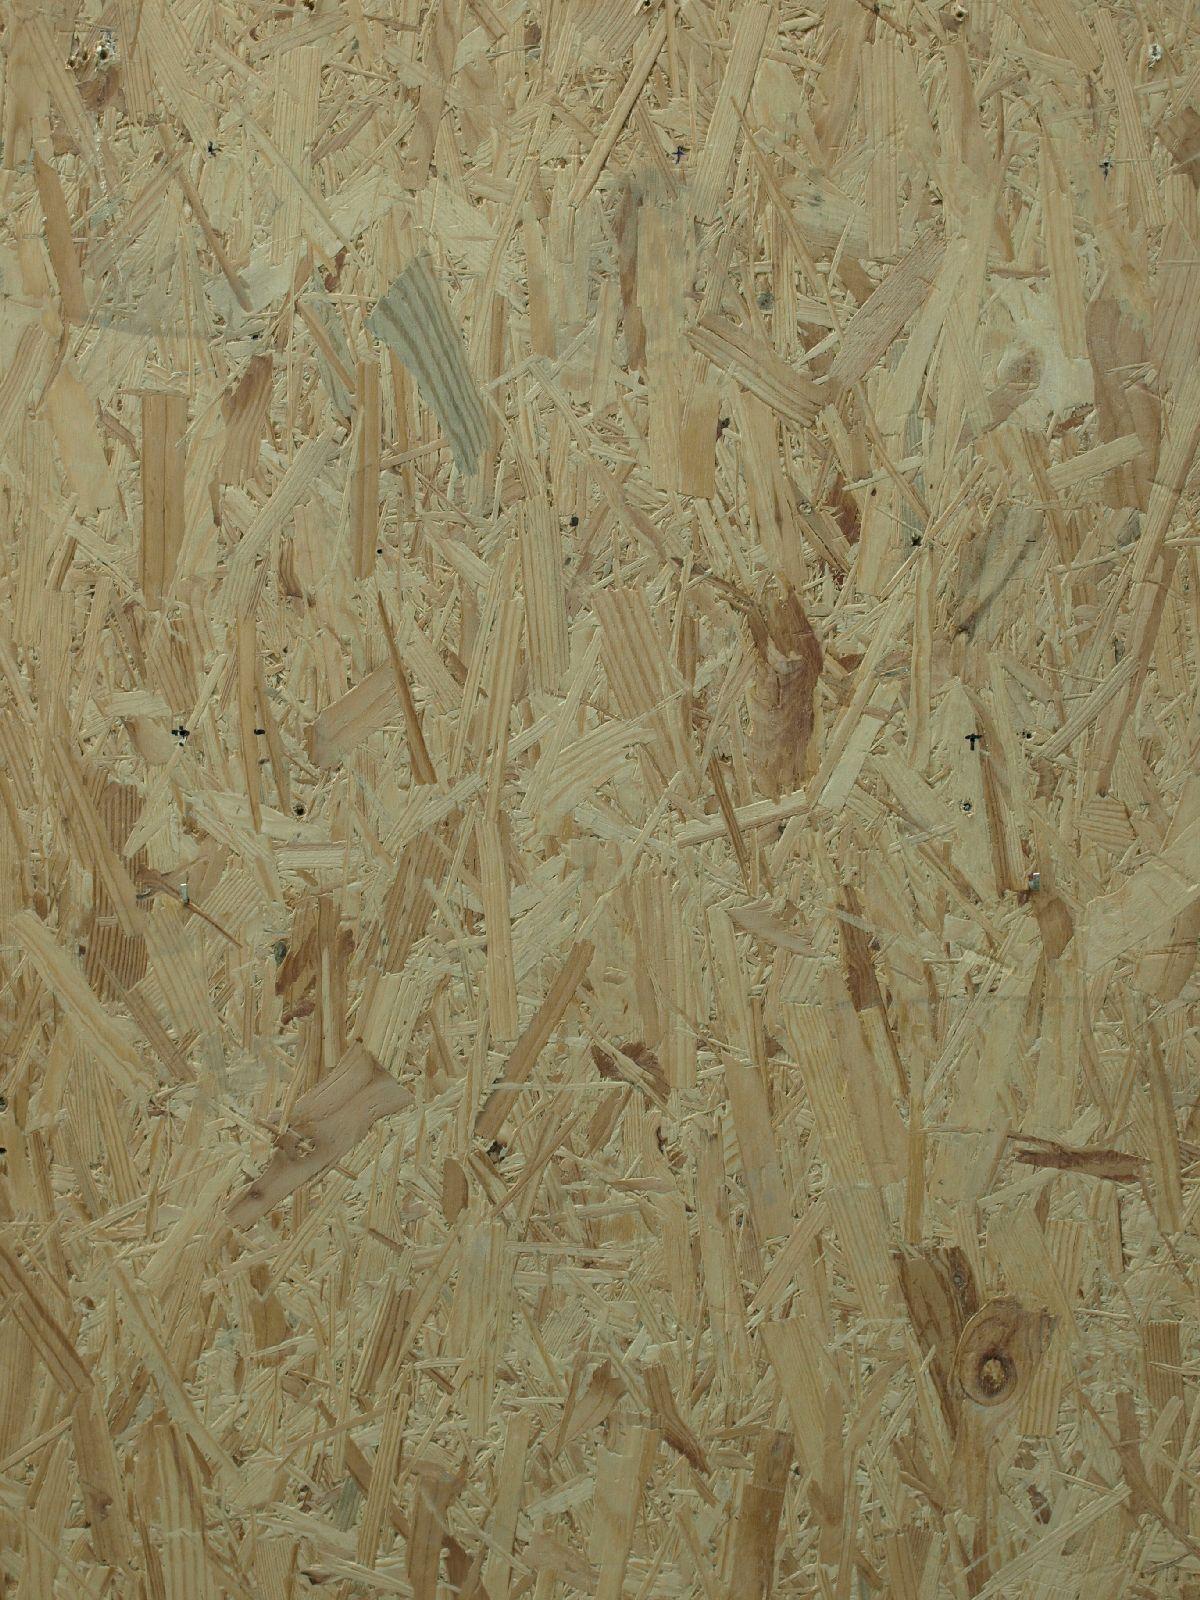 Wood_Texture_A_P1028713